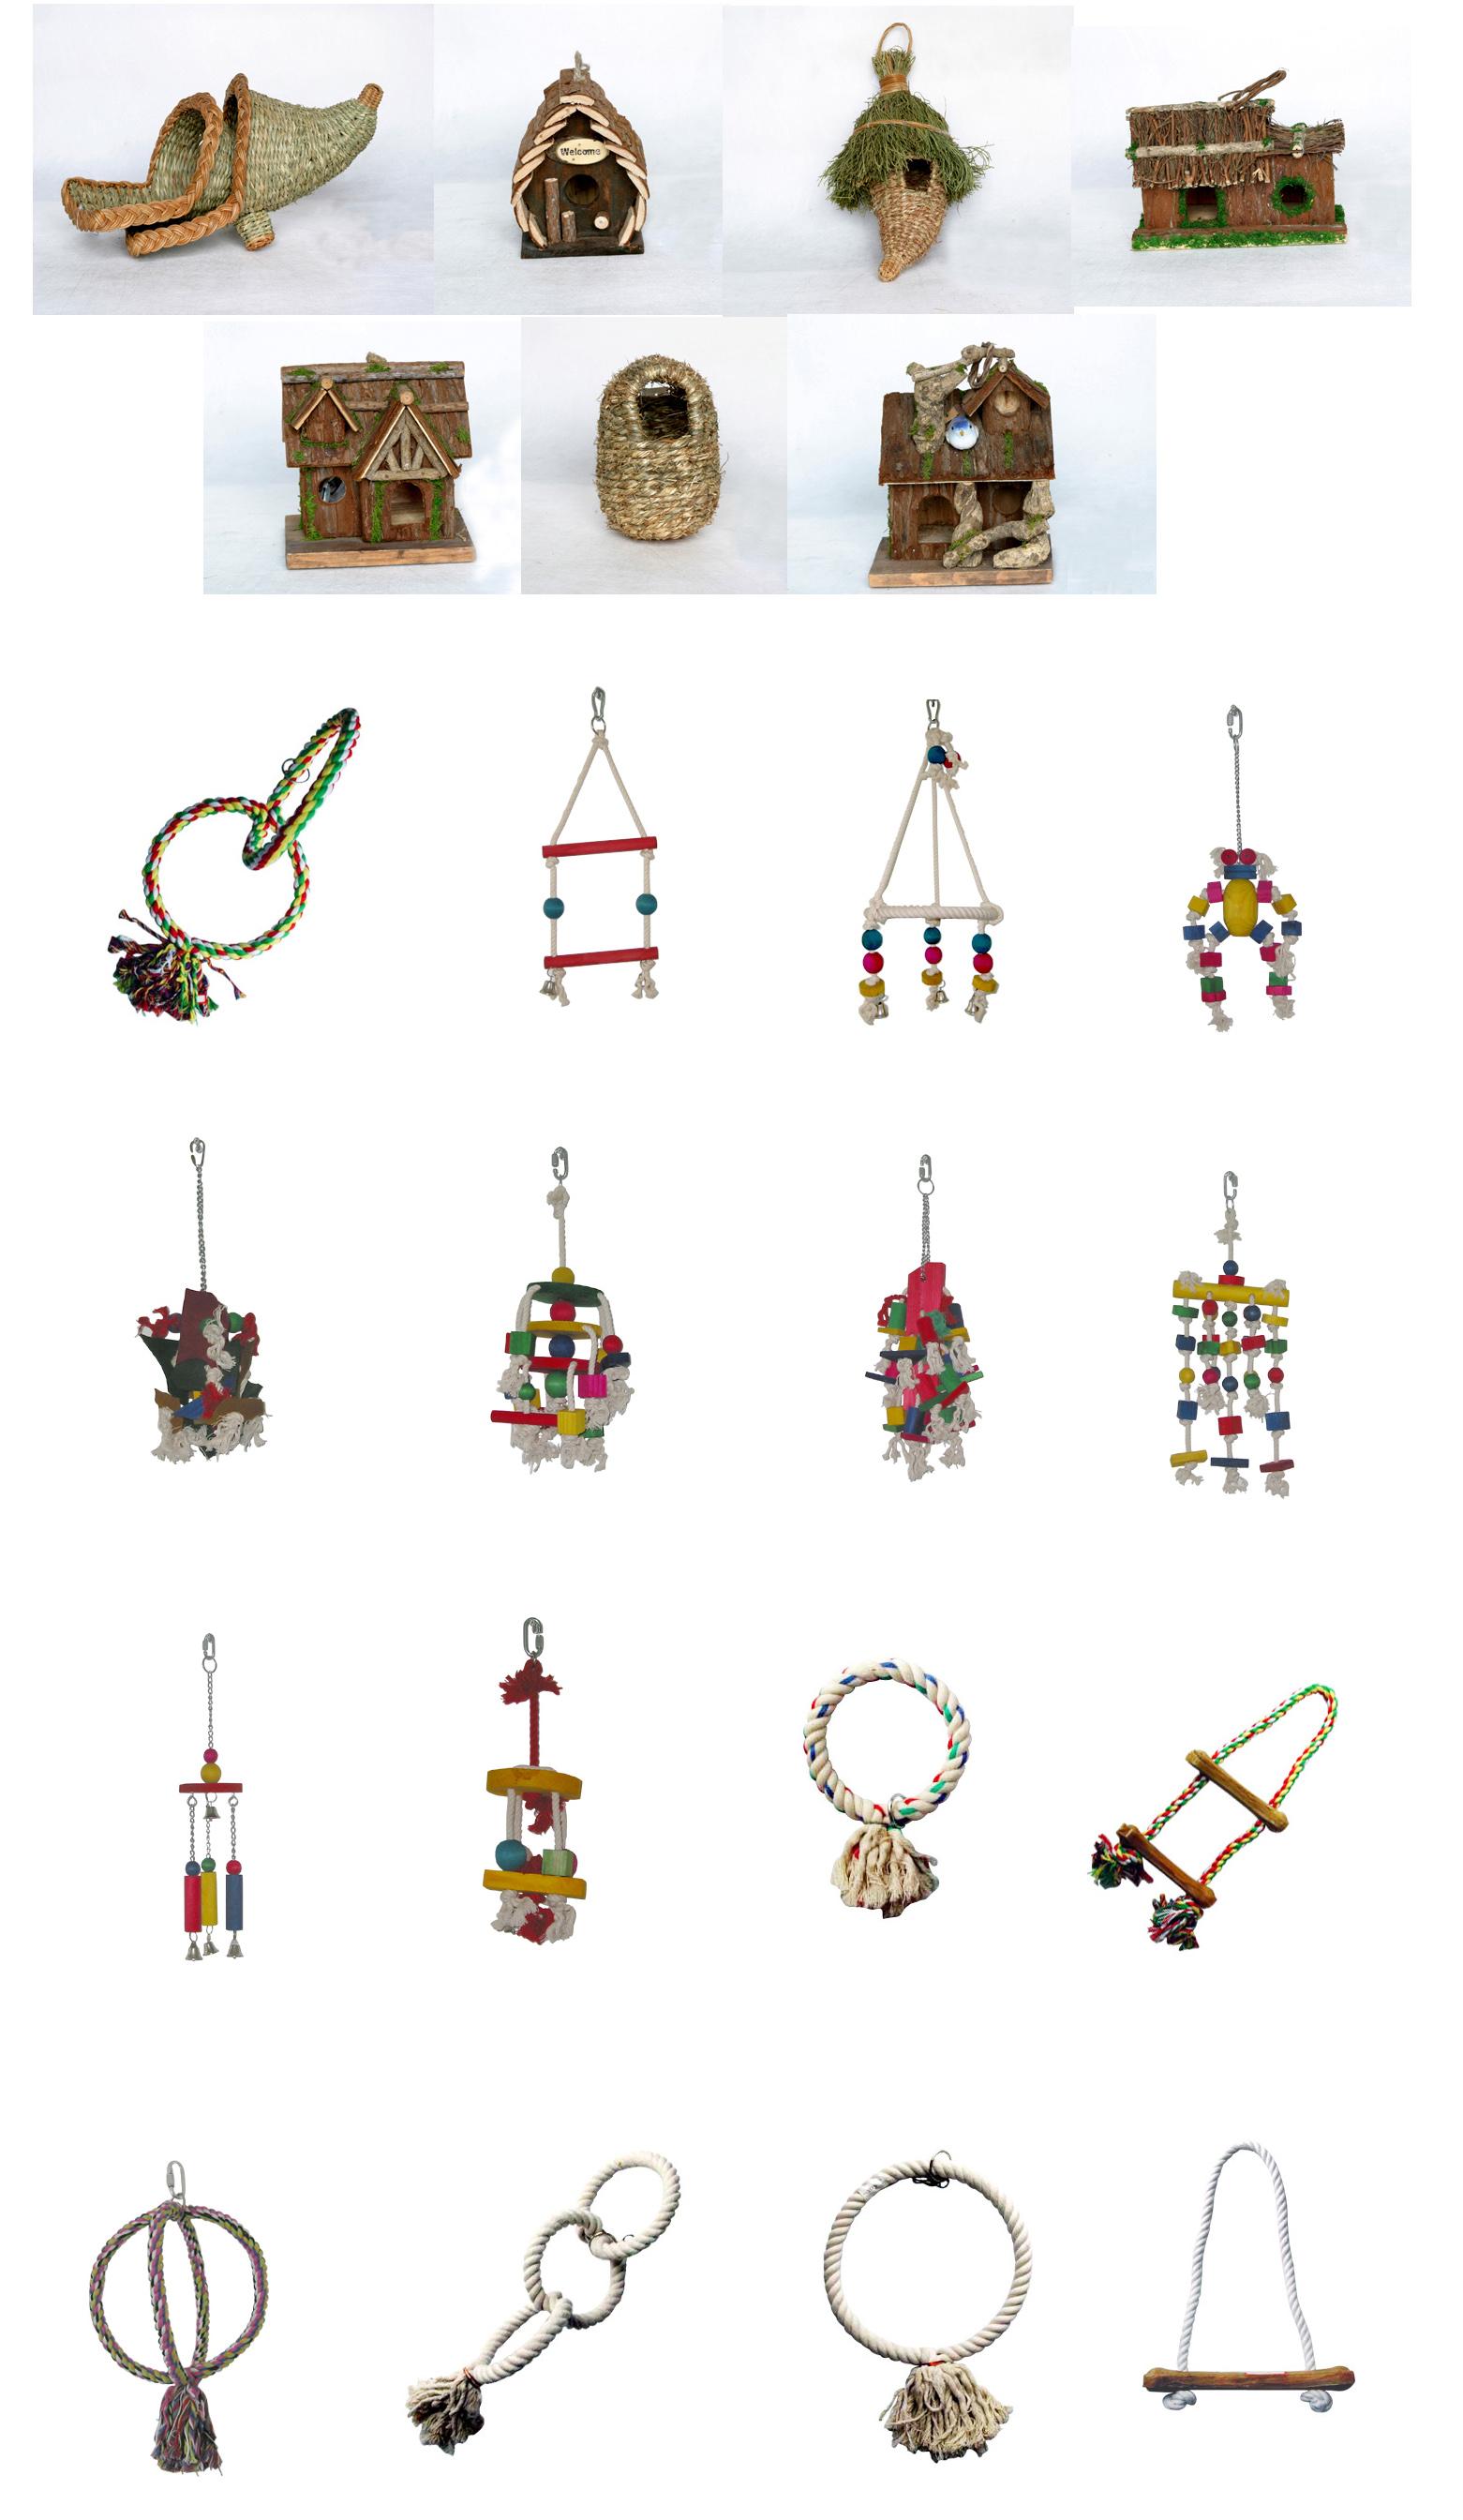 dog toy, pet toys, cat toys, bird feeder, bird supplies, bird house